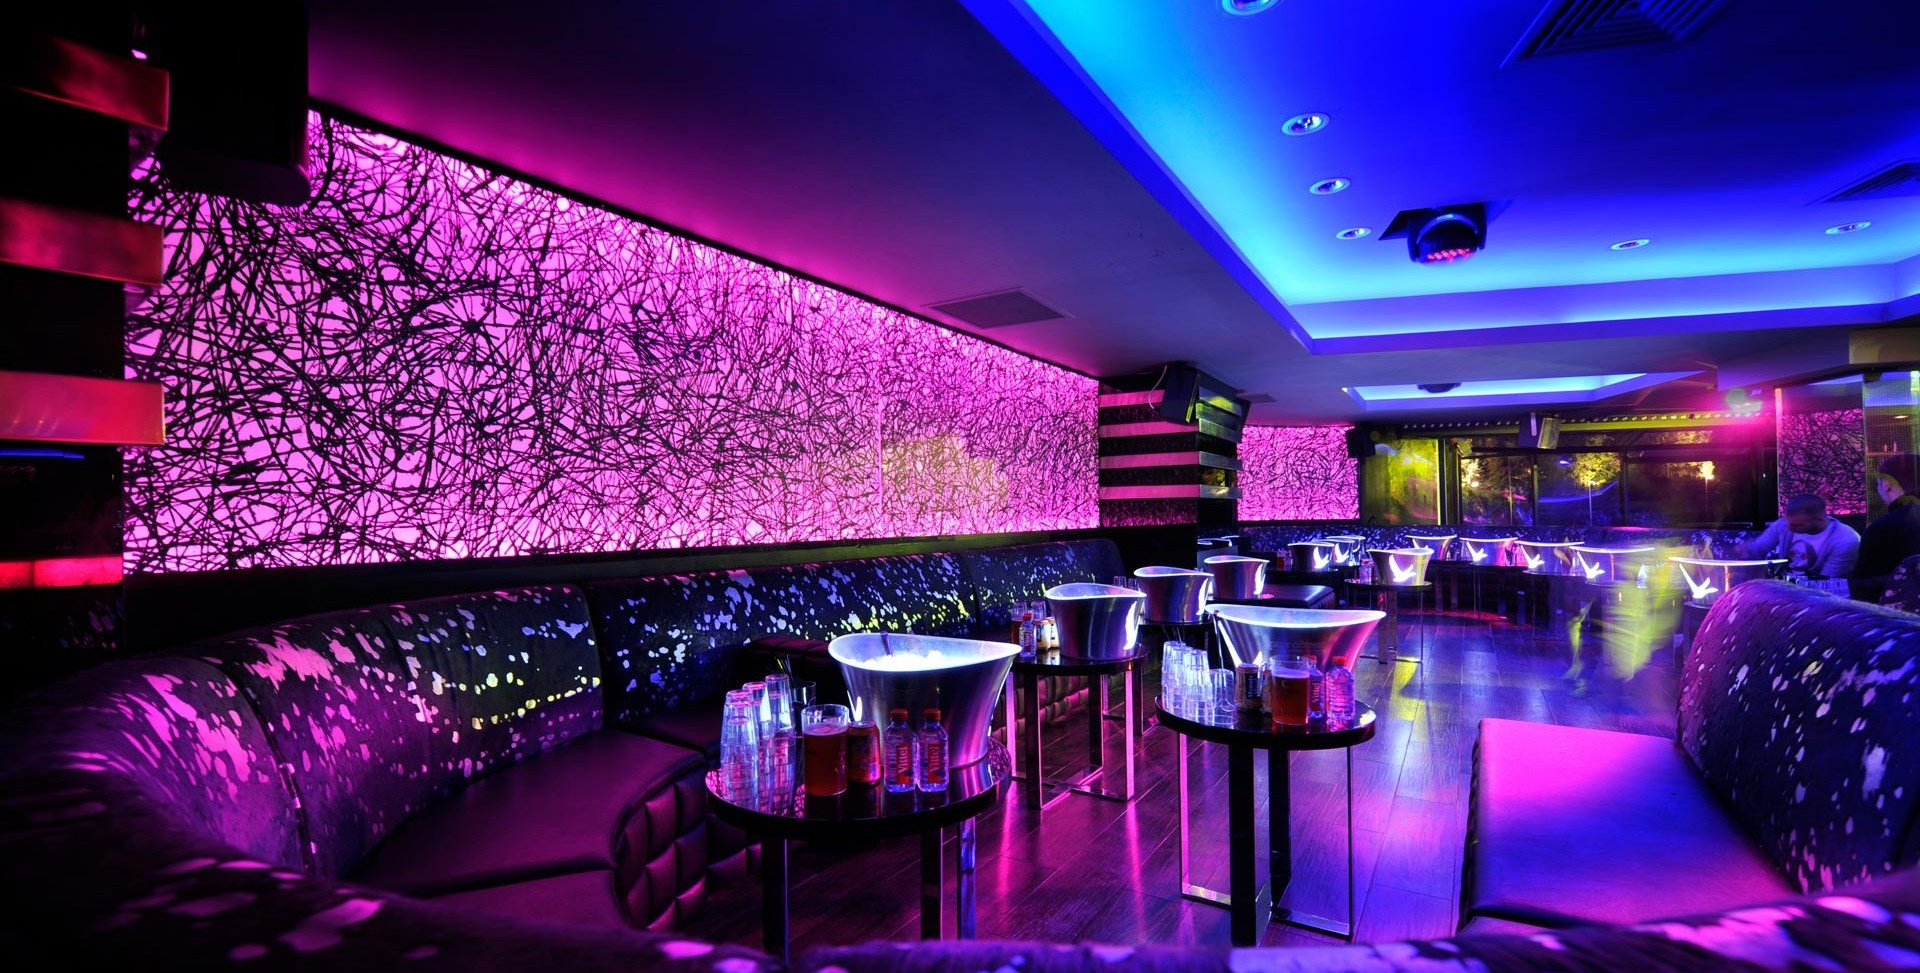 dynaled-club-disco-lighting-examples-4.j